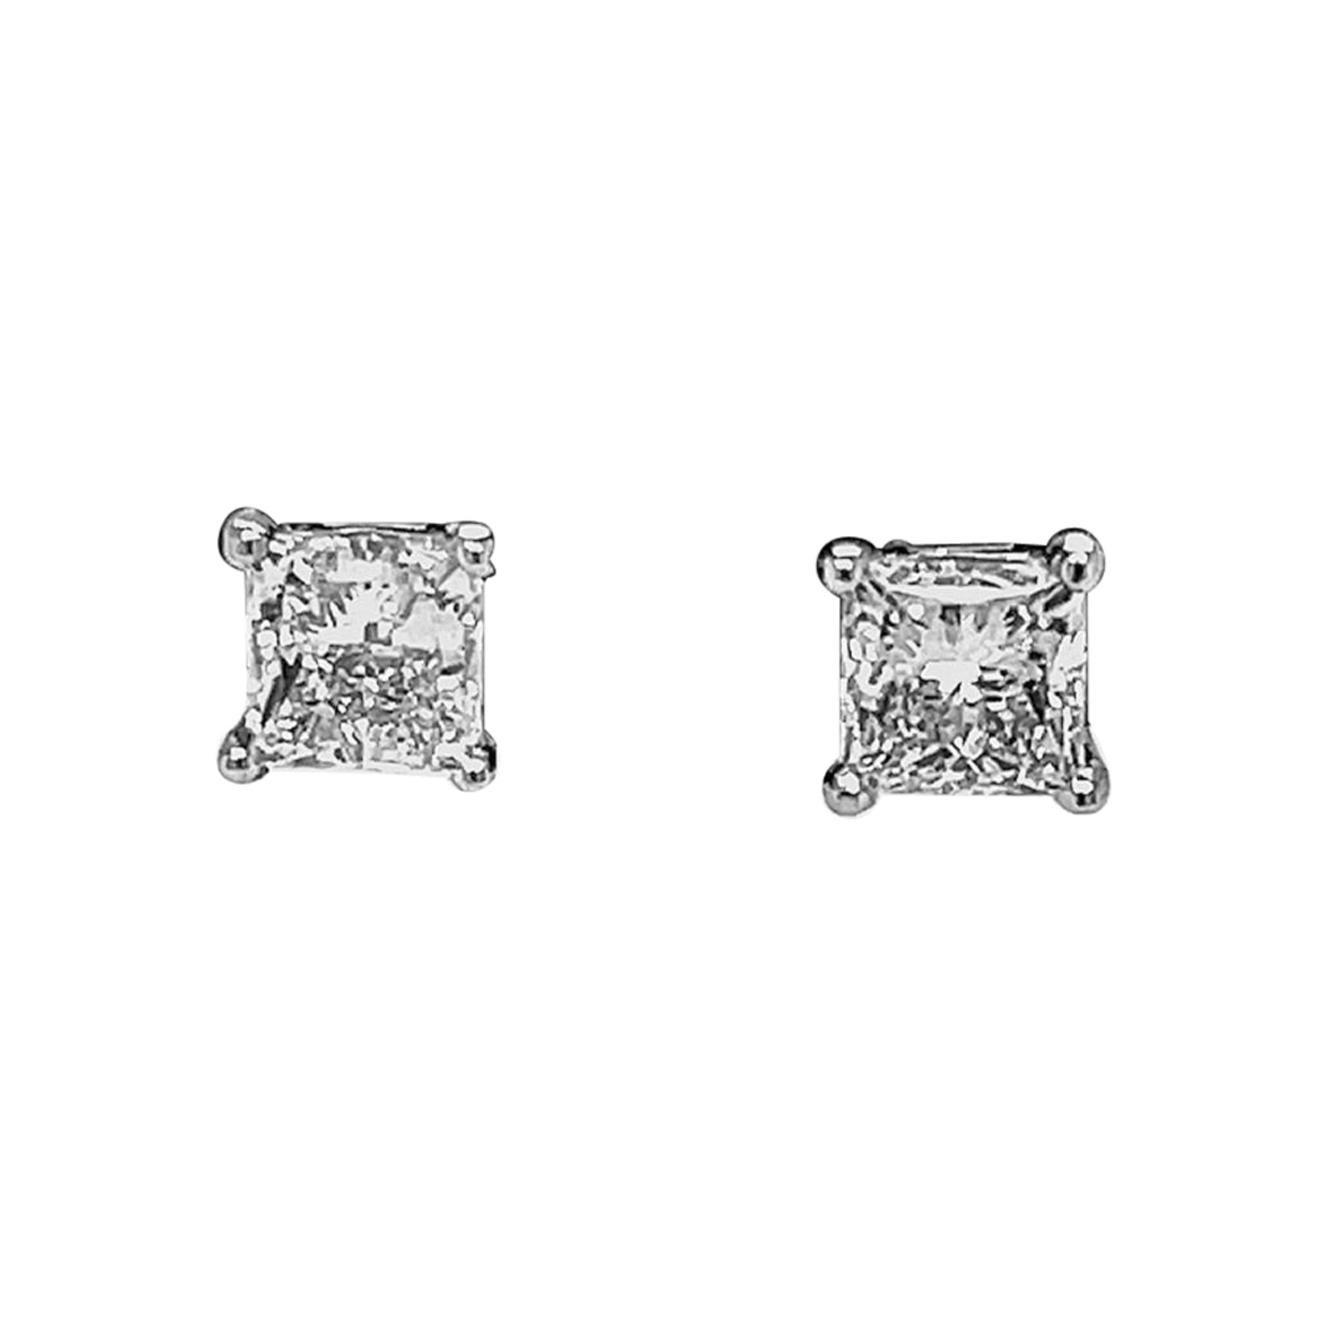 Princess cut Diamond Stud Earrings 2.00 Carats 14k White Gold 4-Prong